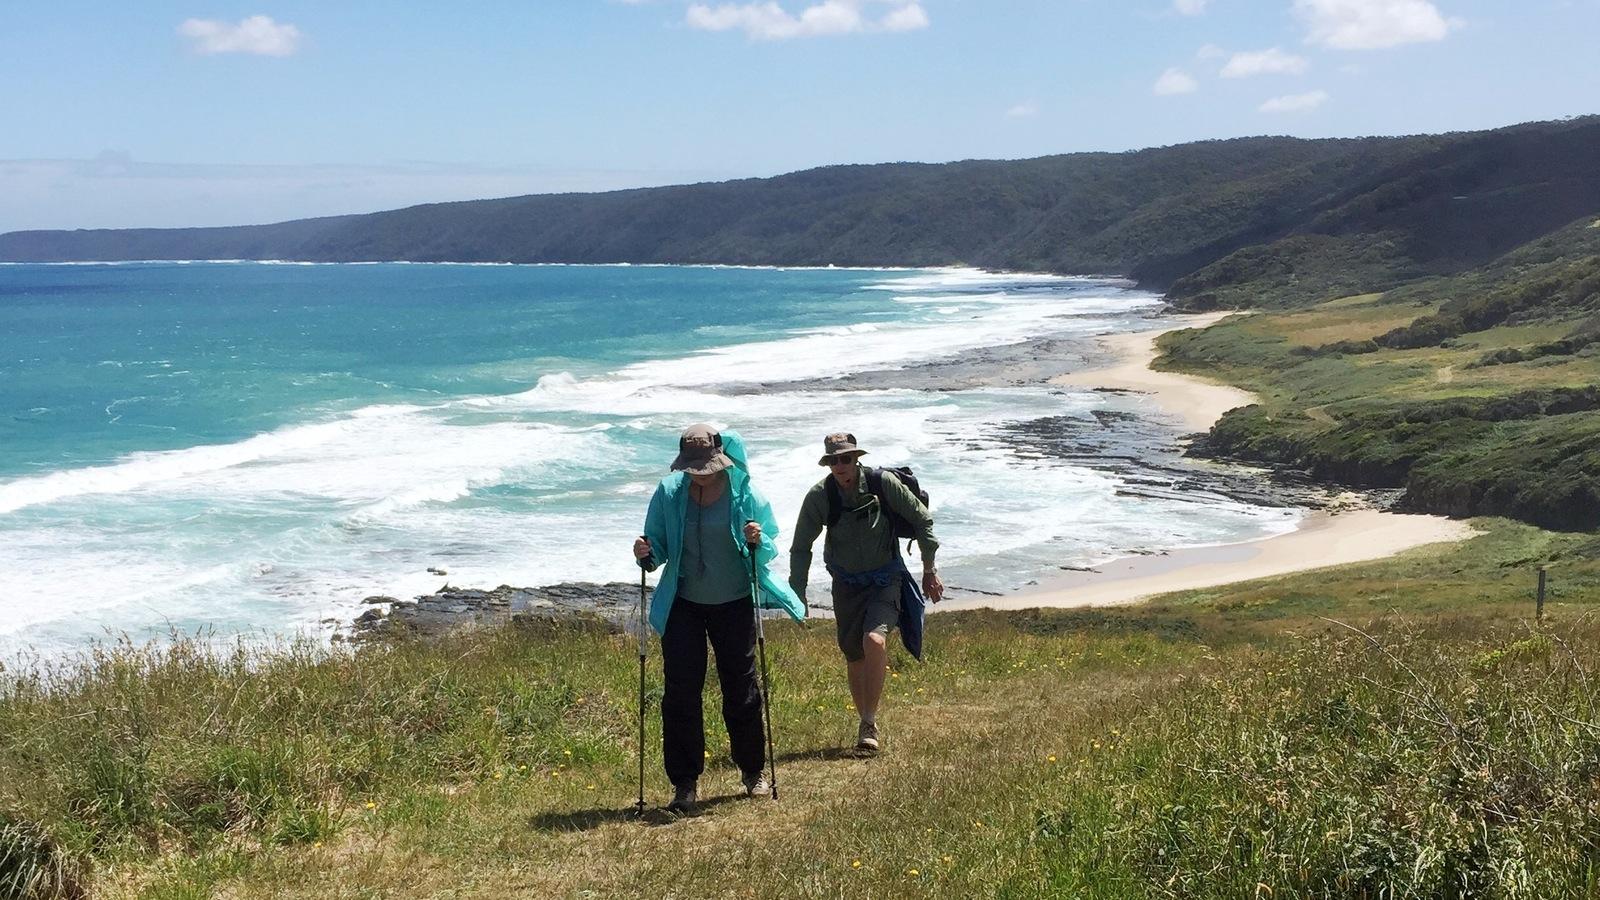 A little bit up on the Great Ocean Walk